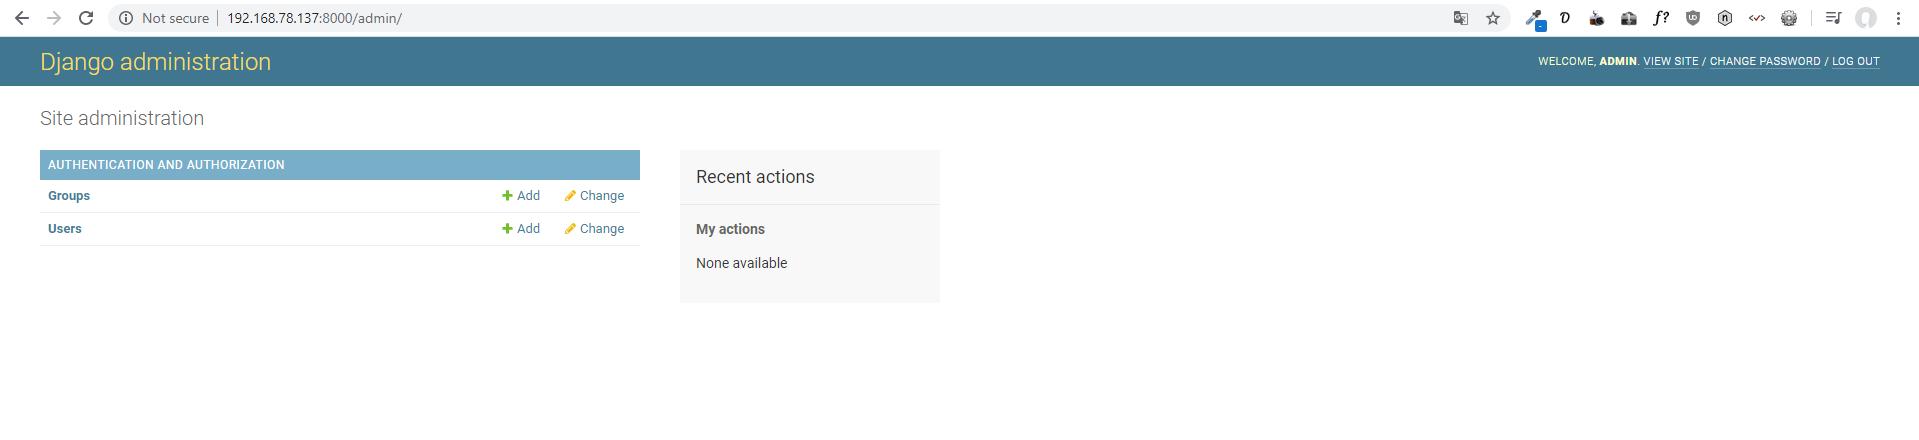 Screenshot_14 - cài đặt Django trên CentOS 7